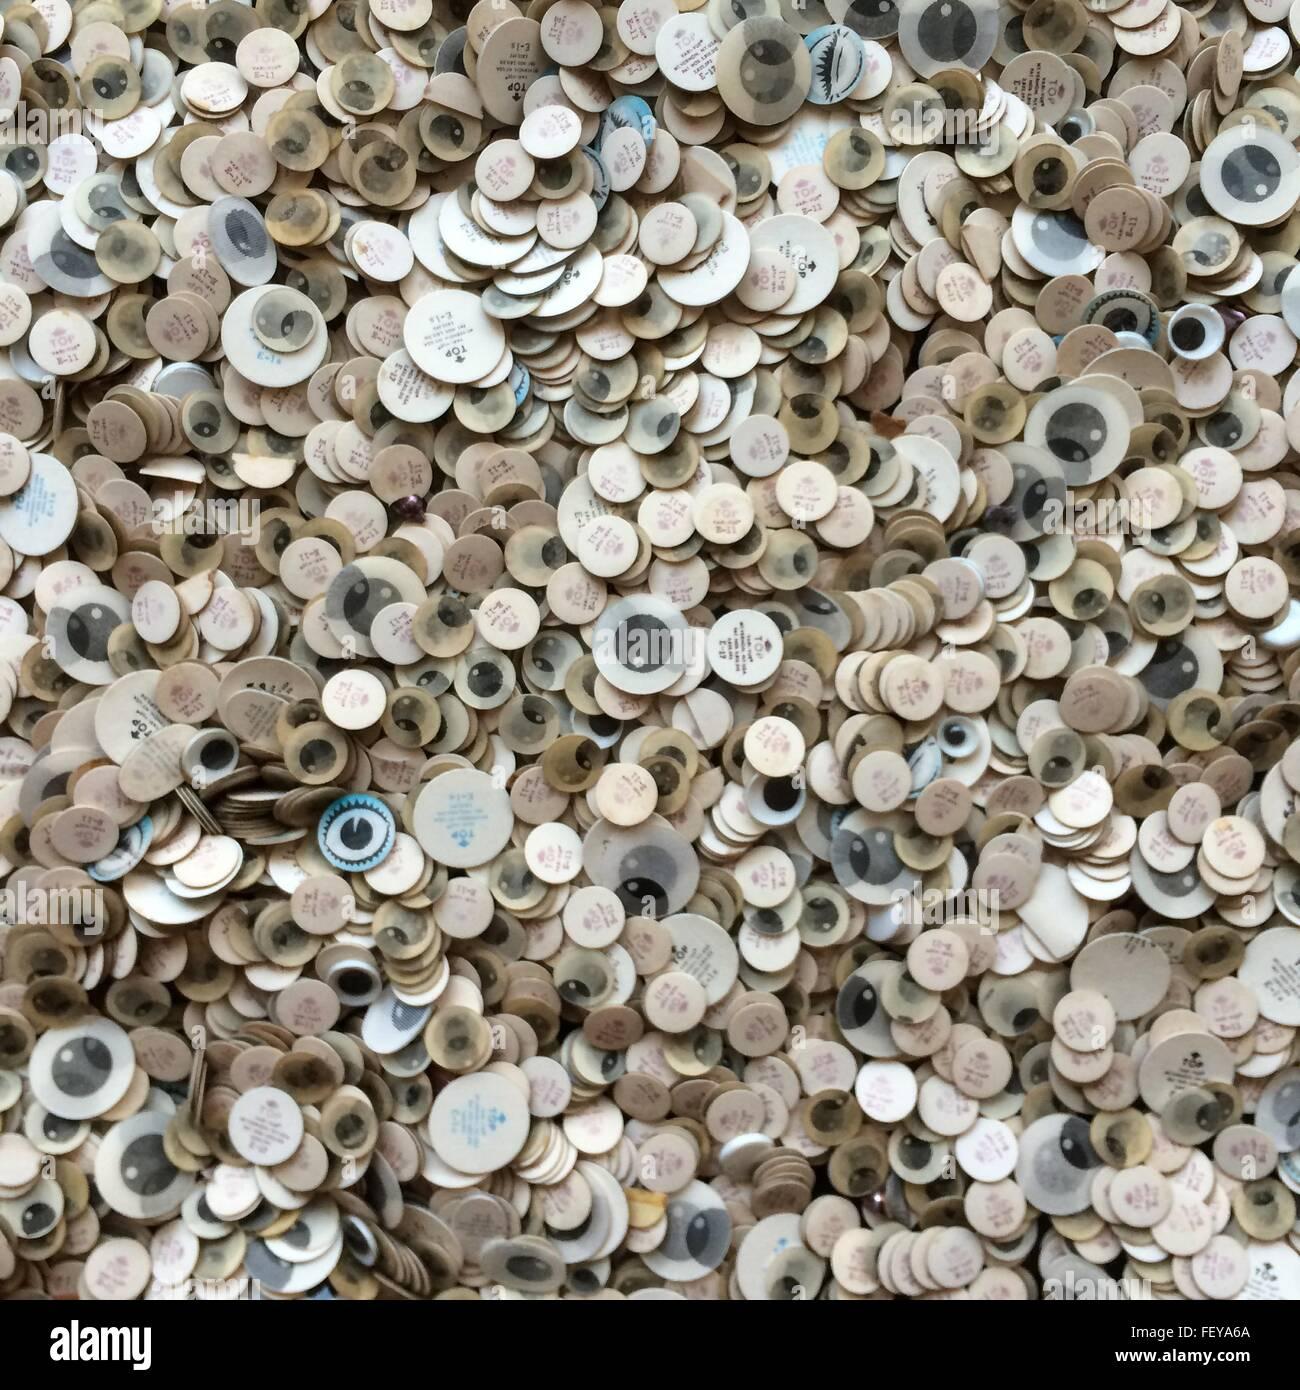 Abundance Of Circular Labels - Stock Image